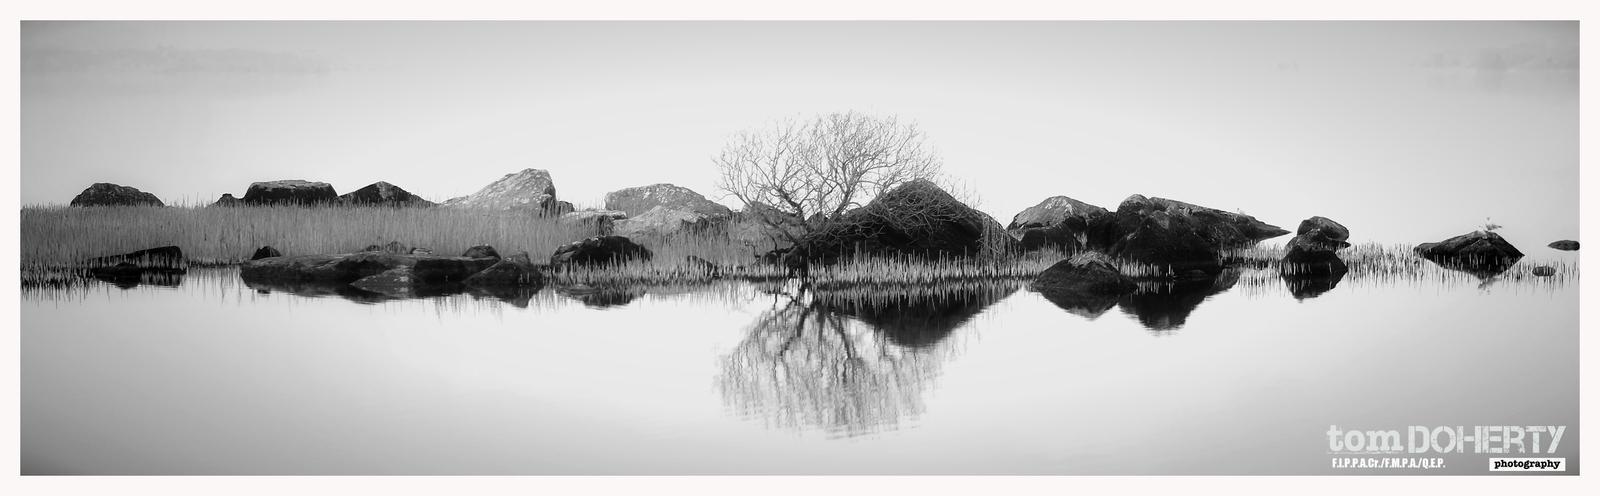 Lough Derg 2, Garrykennedy, Co. Tipperary by PicTd